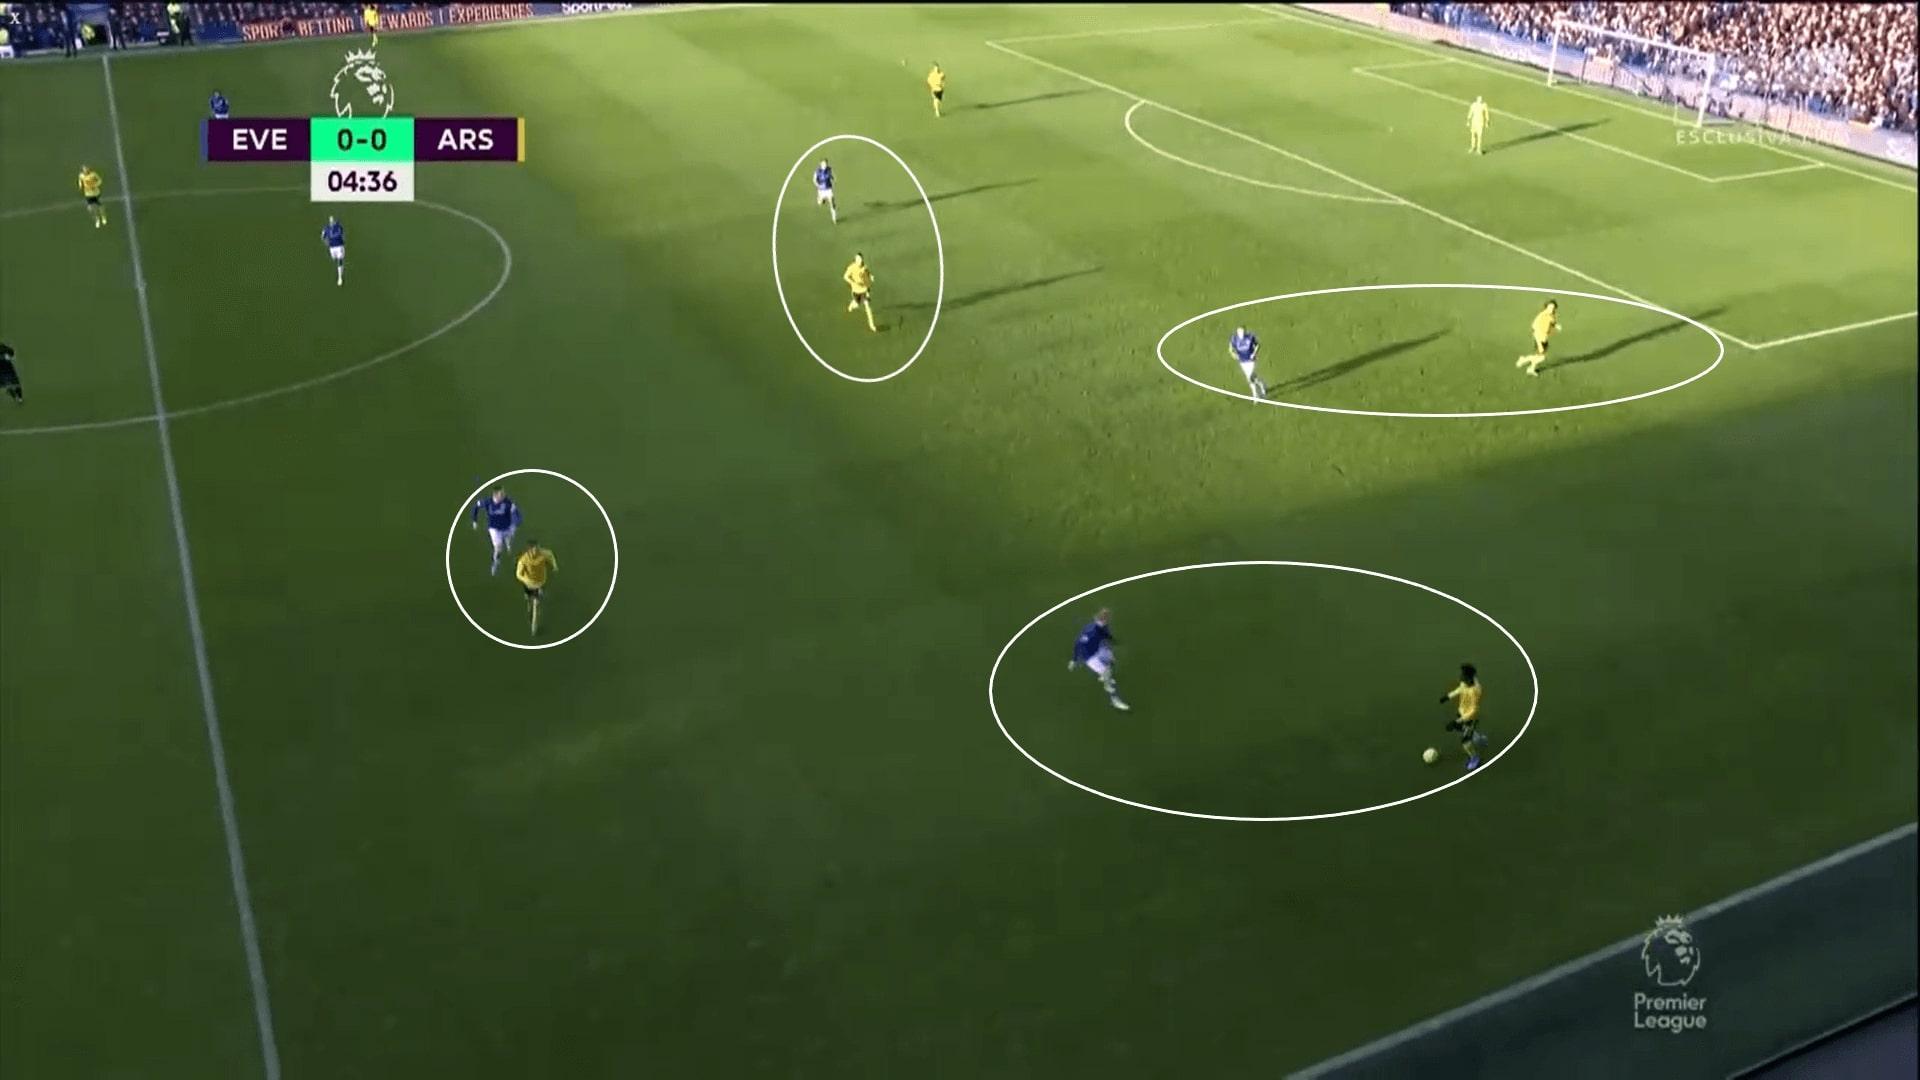 Premier League 2019/20: Everton vs Arsenal - tactical analysis tactics